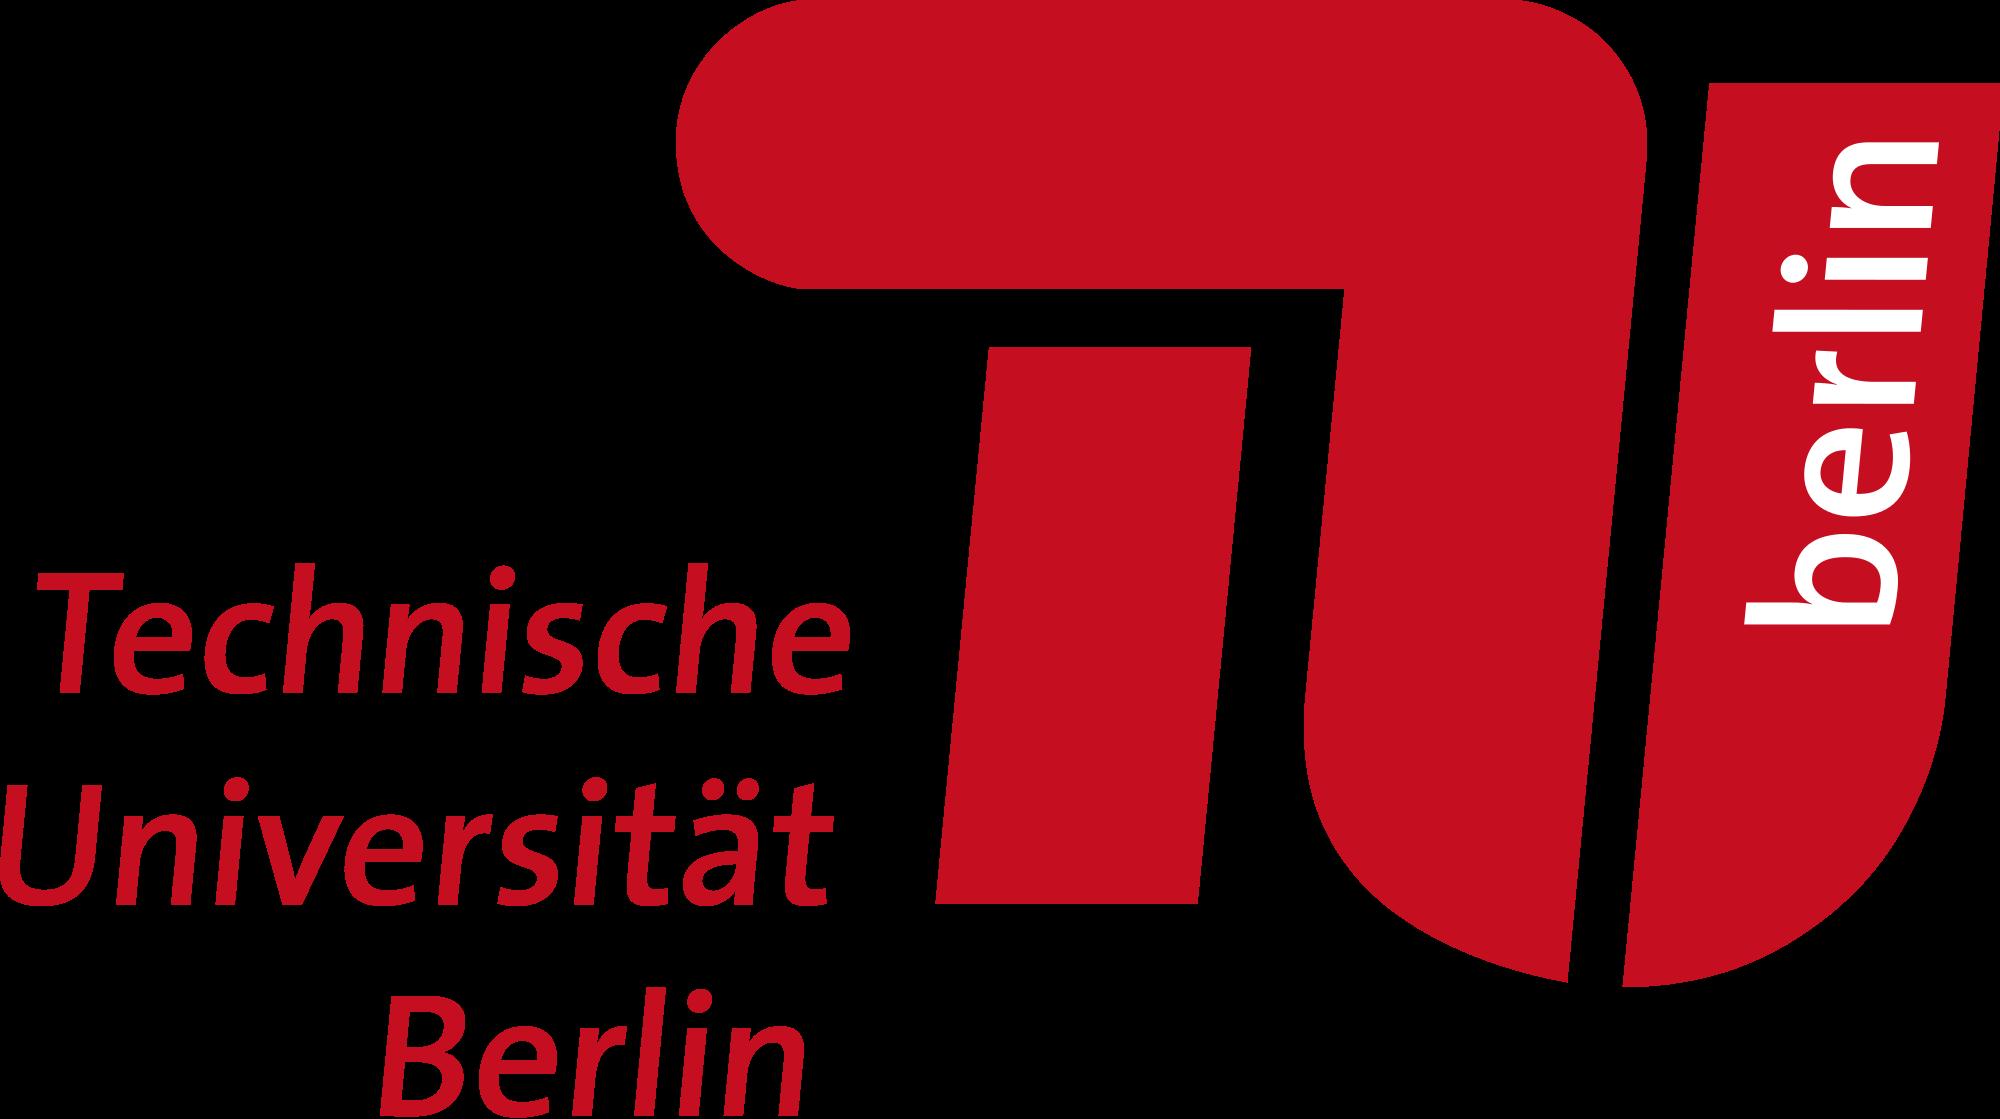 logo Technische Universität Berlin